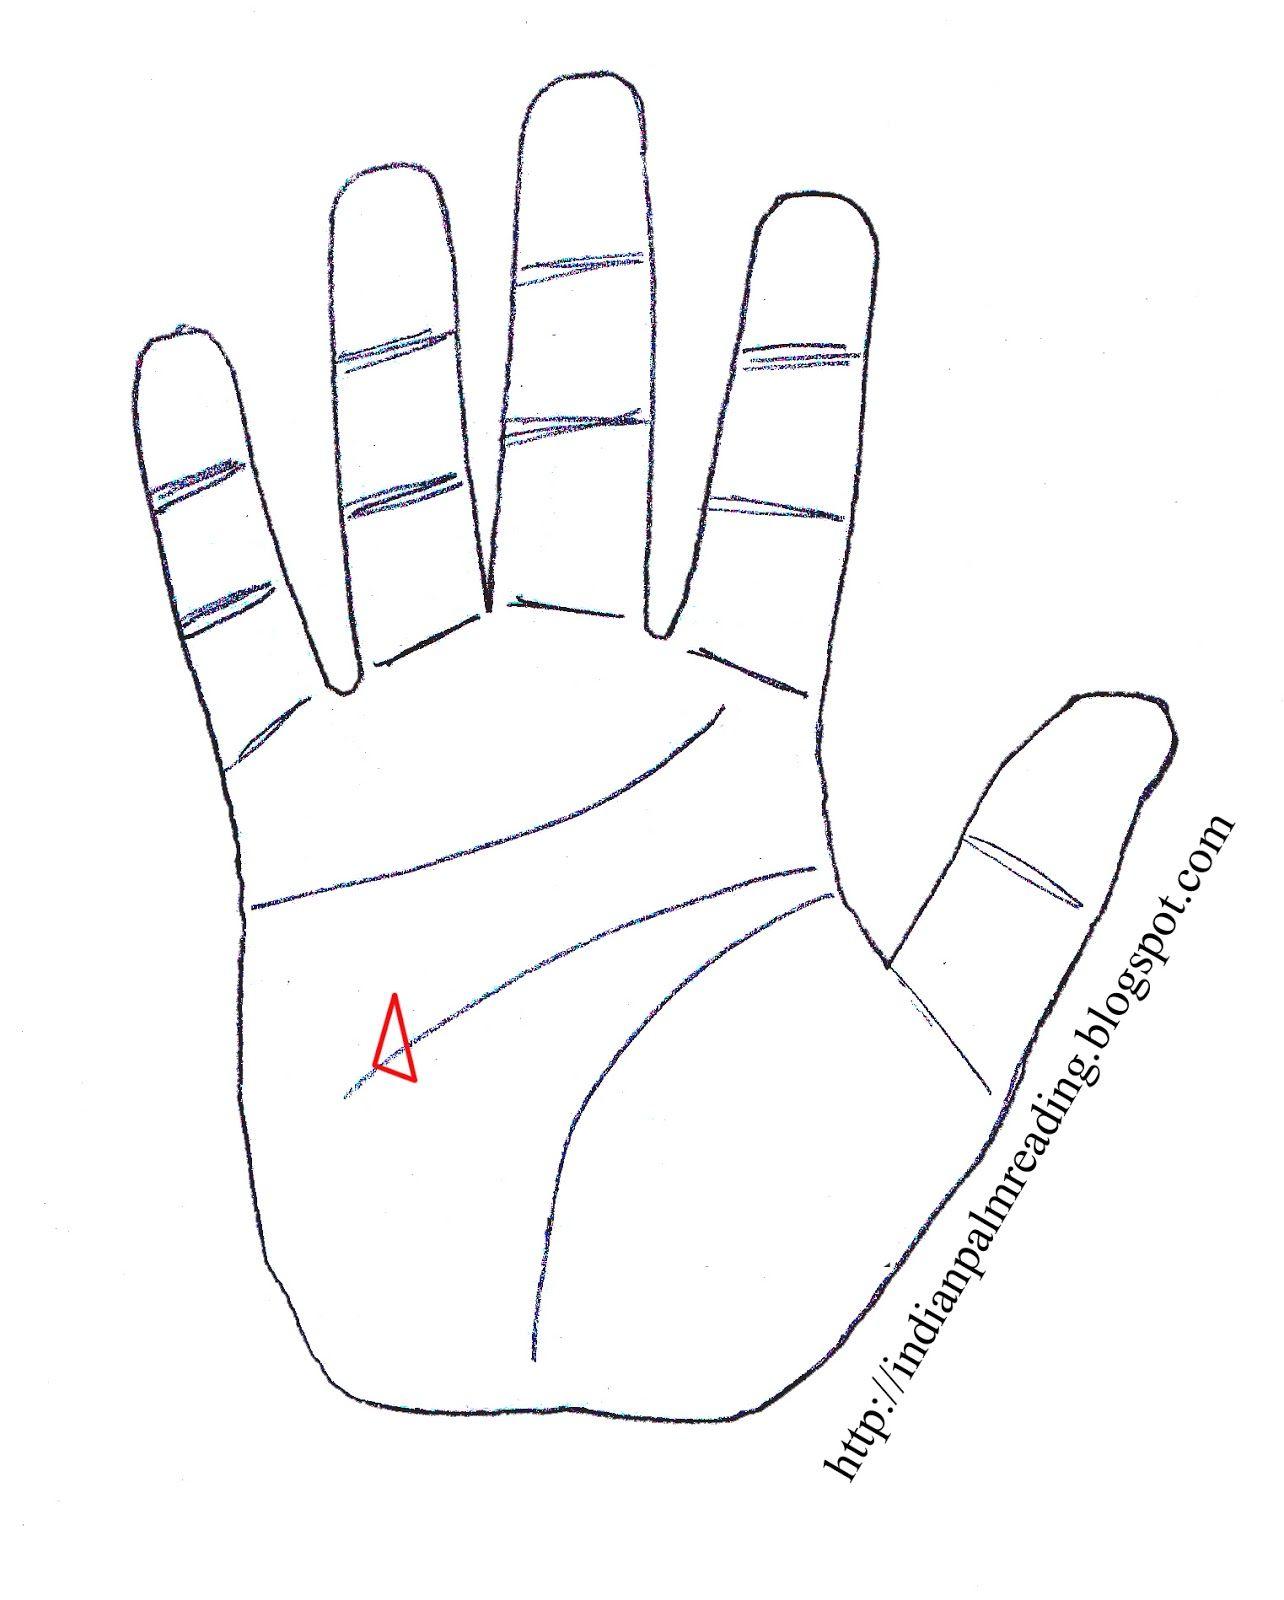 Triangle On Head Line Under Mount Of Mercury Palmistry Palm Reading Palmistry Indian Palmistry